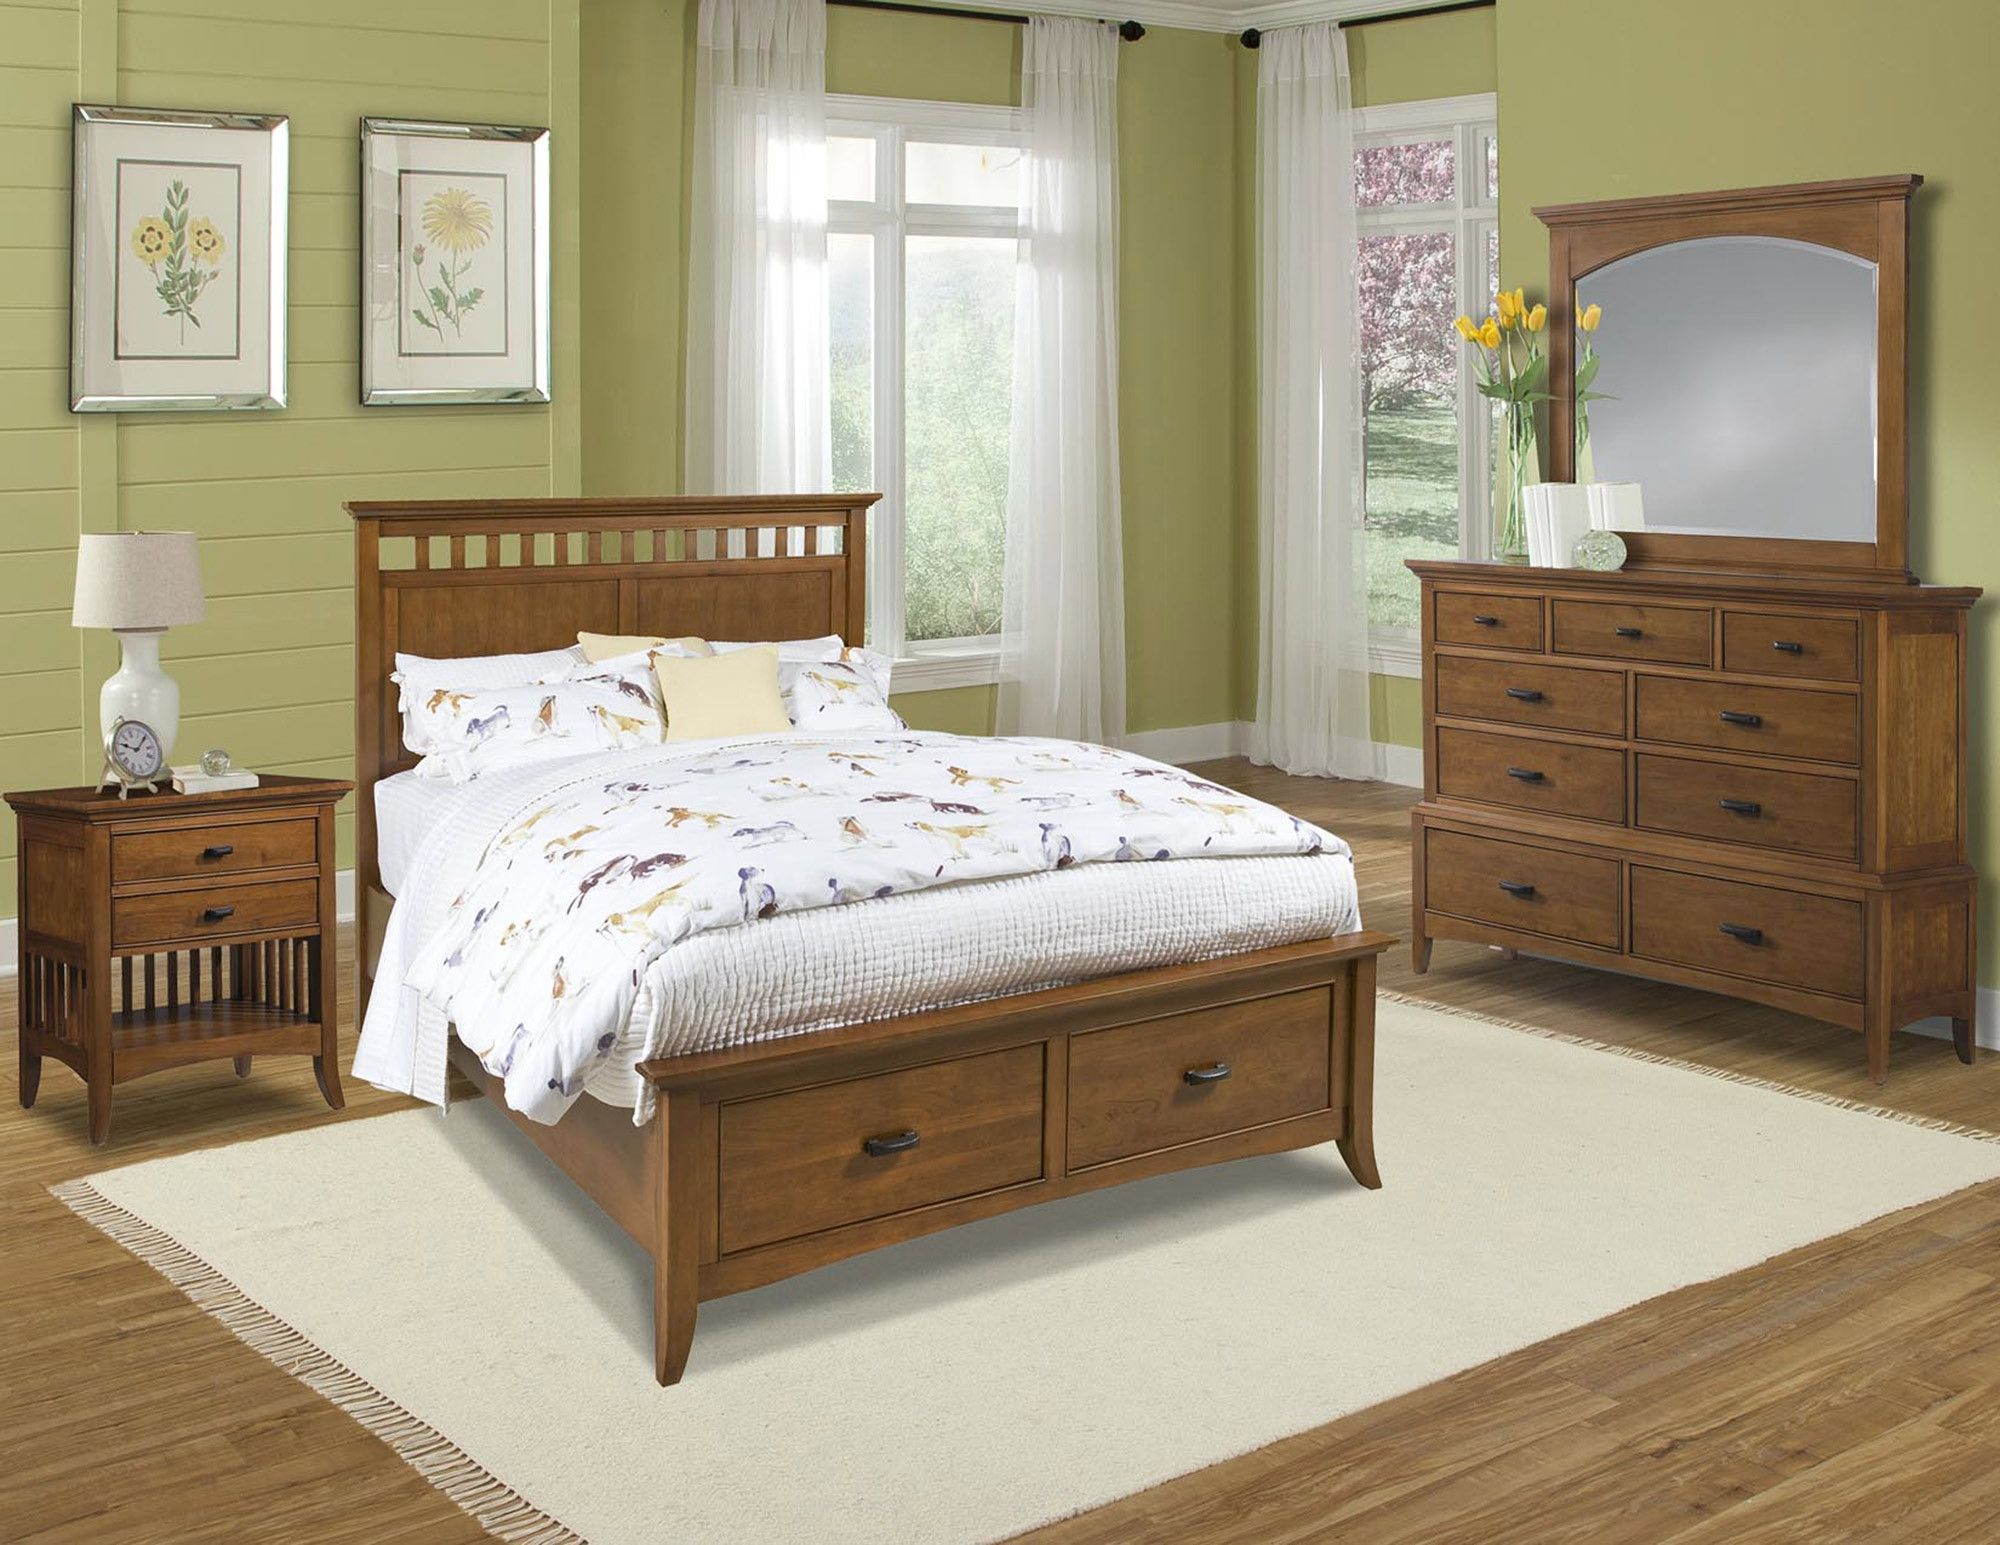 Attrayant Modern Shaker Storage Bedroom Set | Cresent Furniture | Home Gallery Stores